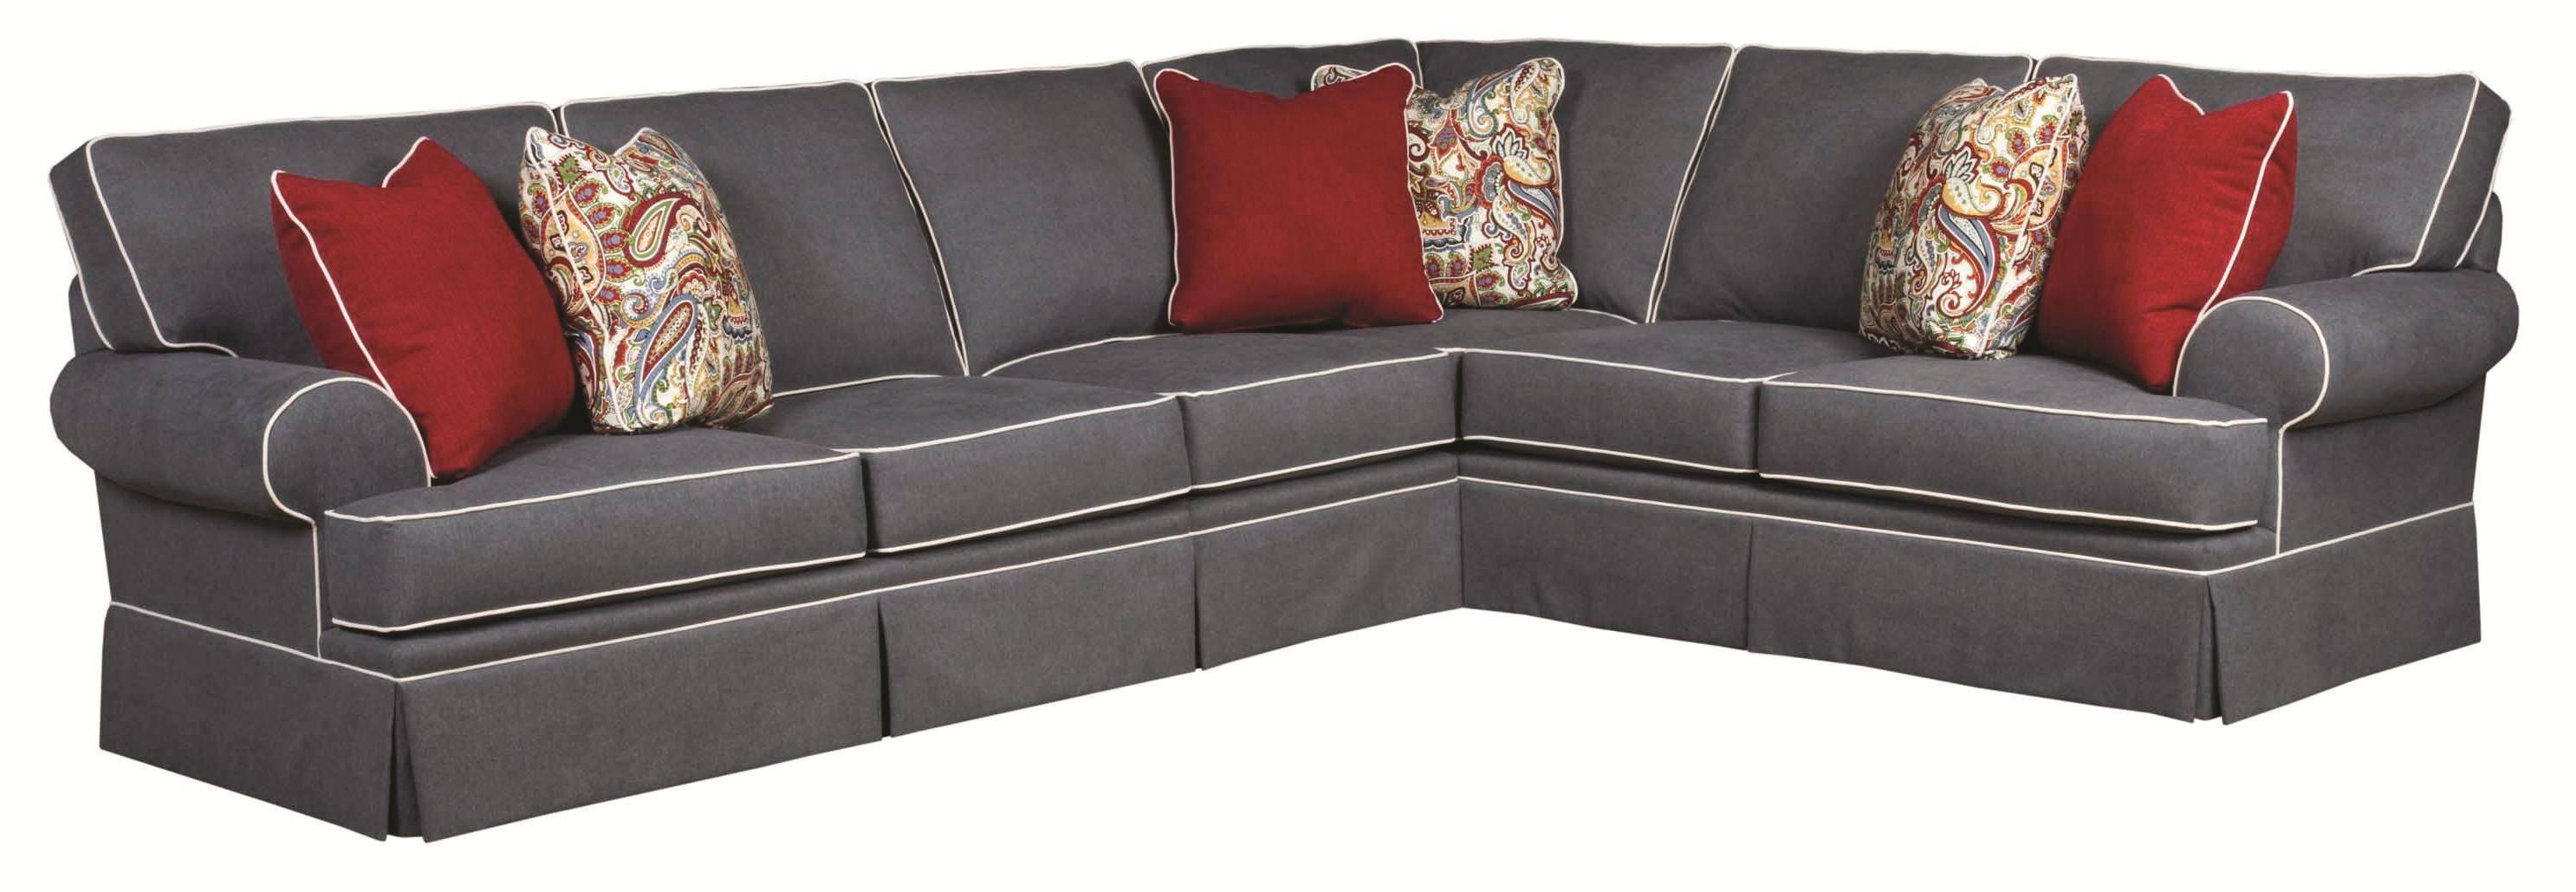 Broyhill Reclining Sofas | Centerfieldbar throughout Broyhill Reclining Sofas (Image 8 of 15)